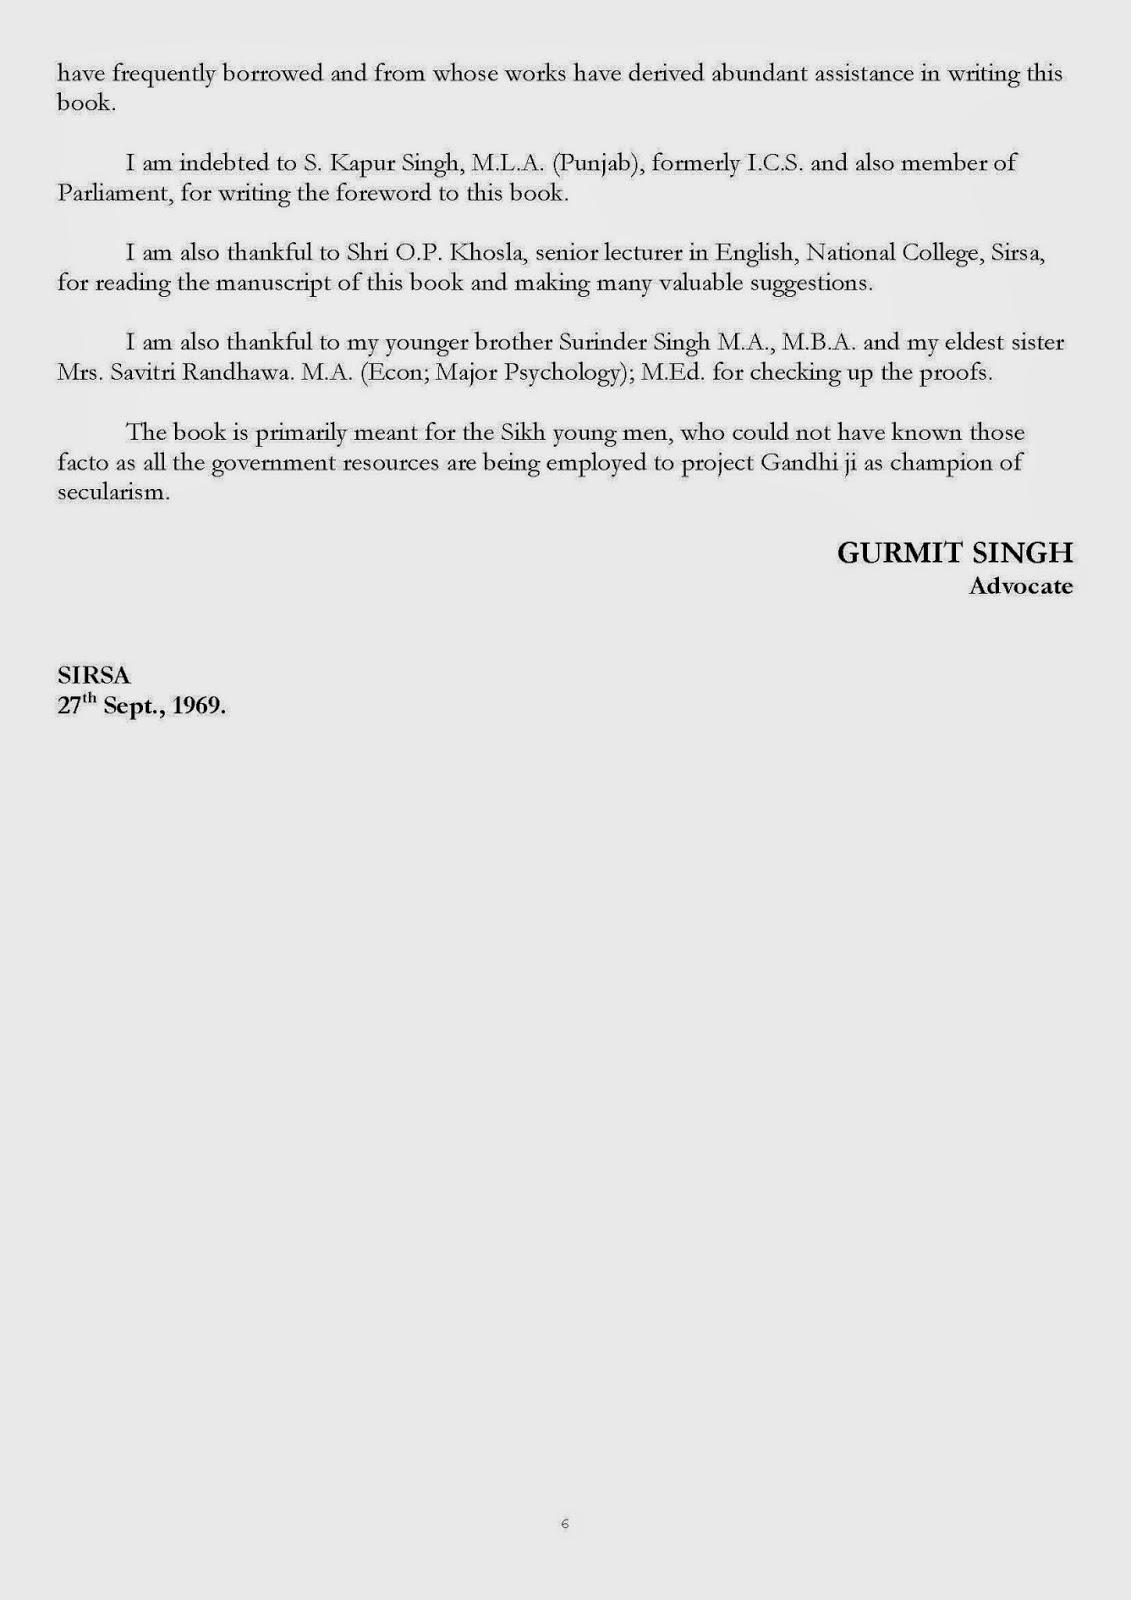 Sikh Digital Library: July 2014